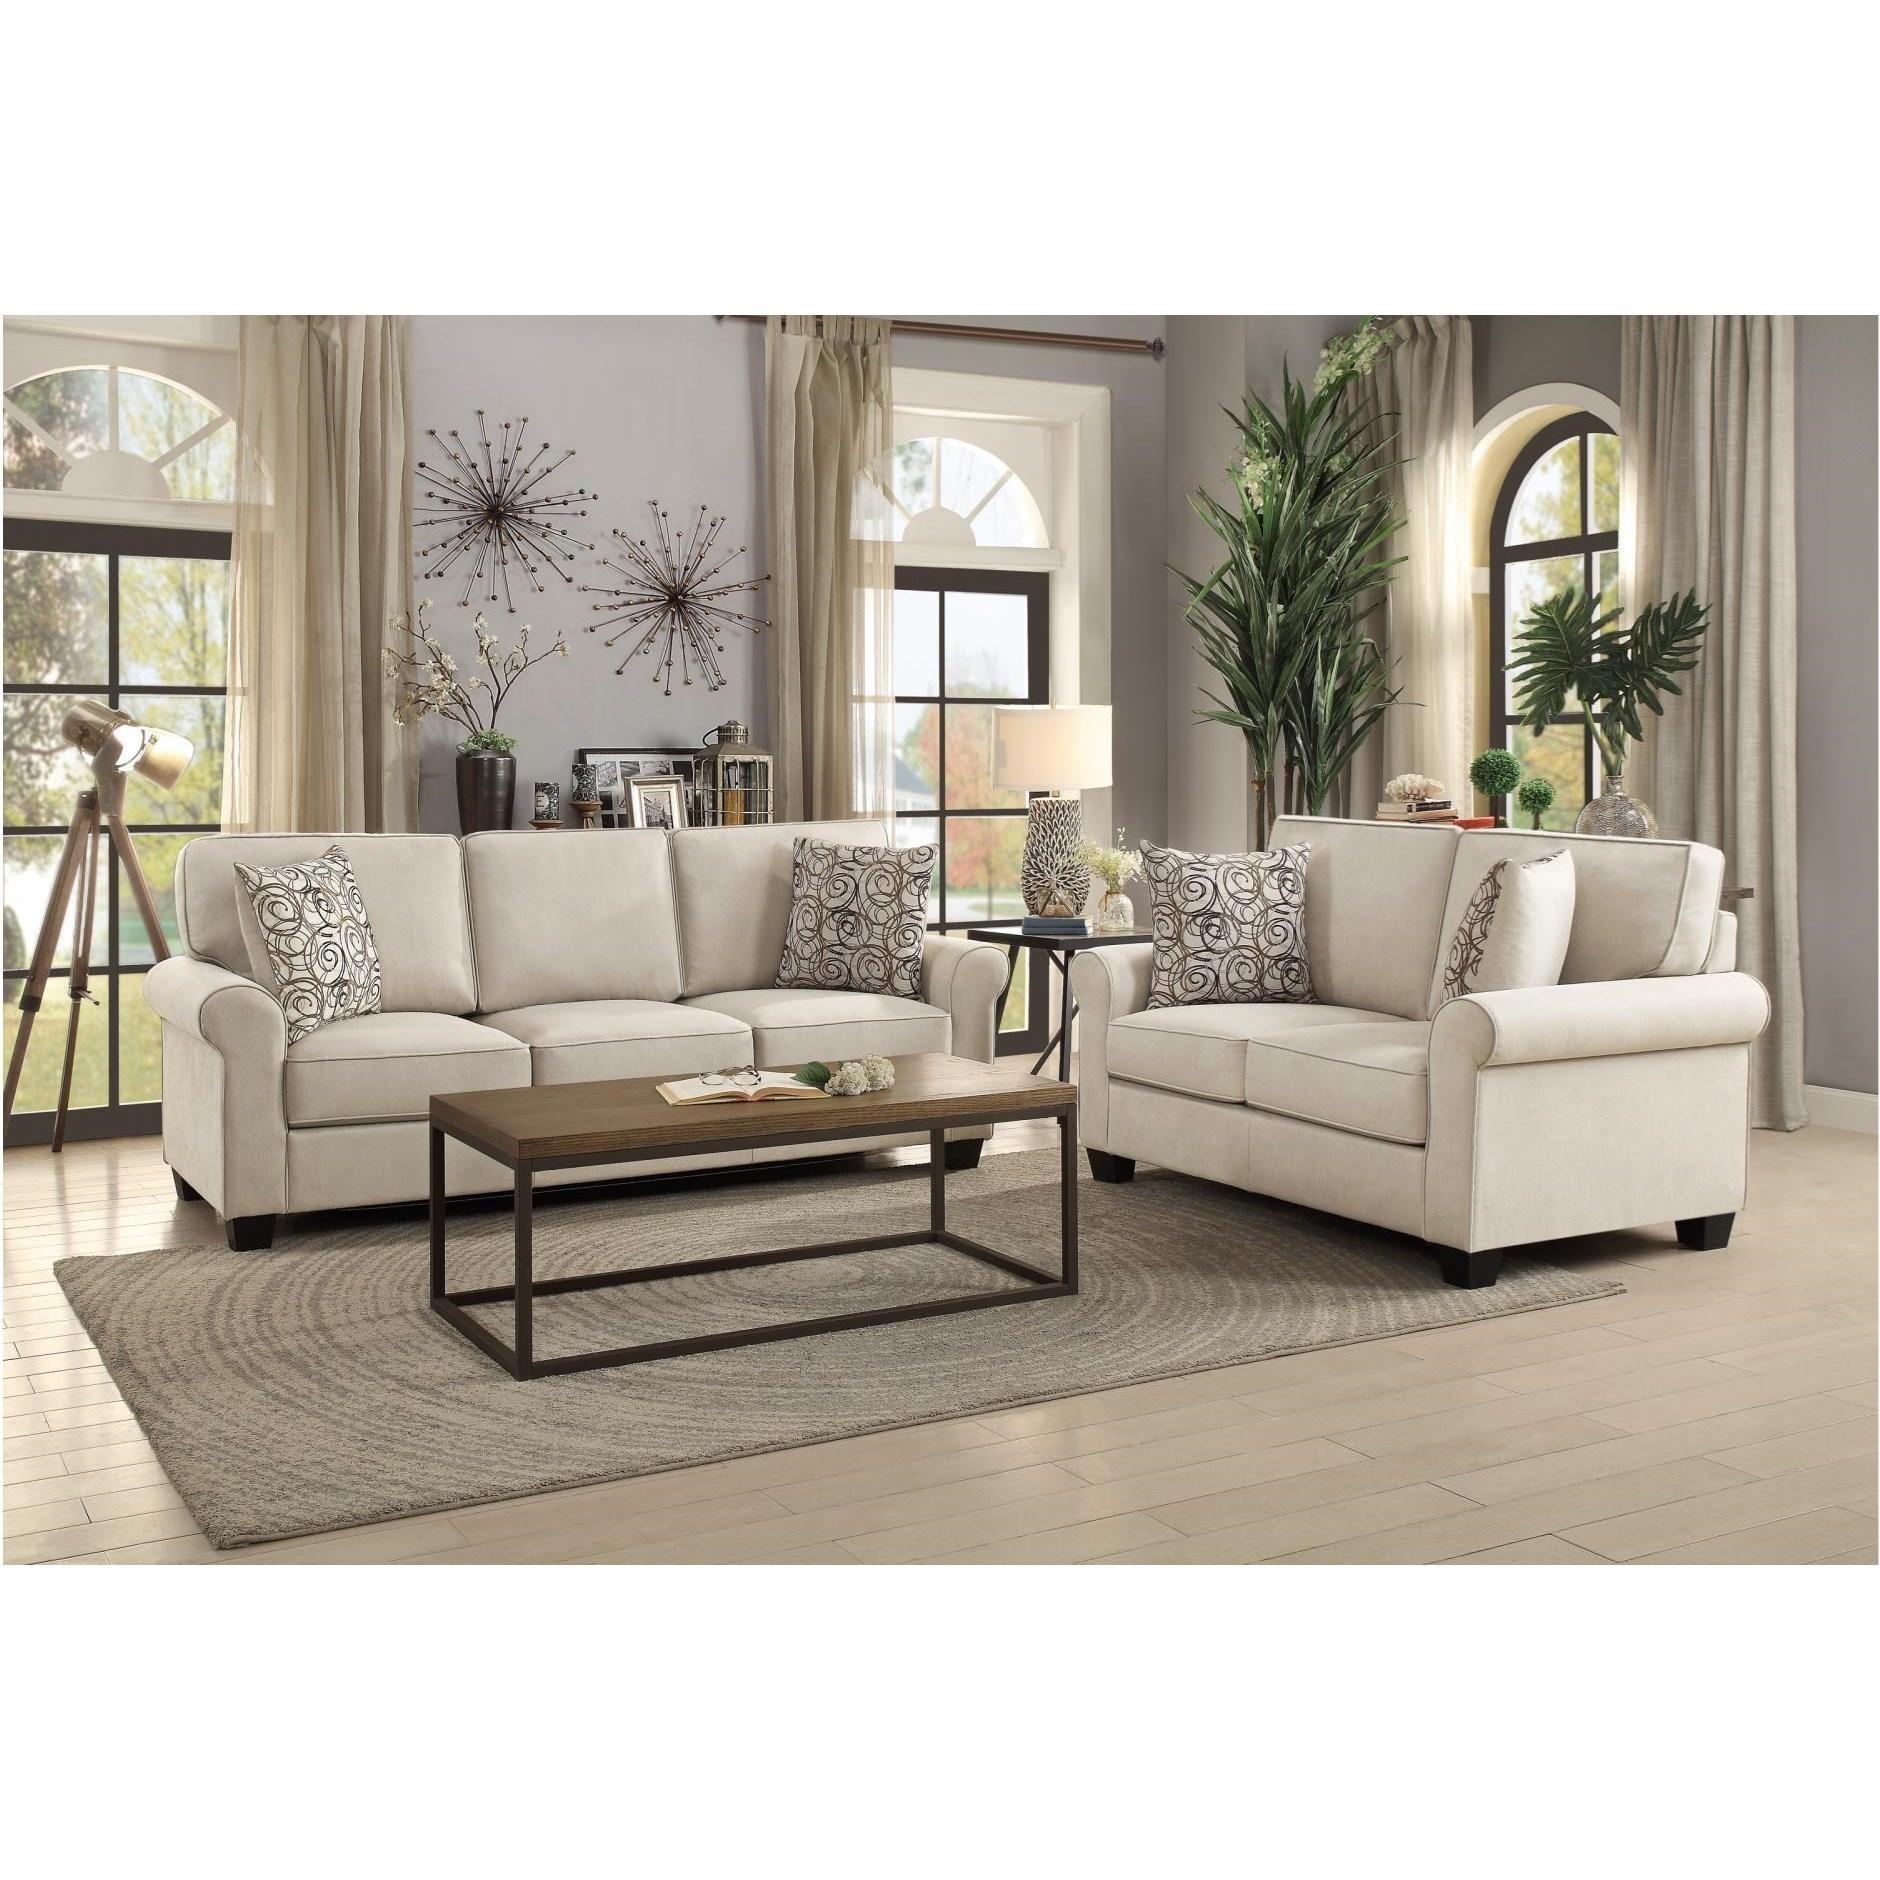 Selkirk Living Room Group by Homelegance at Carolina Direct